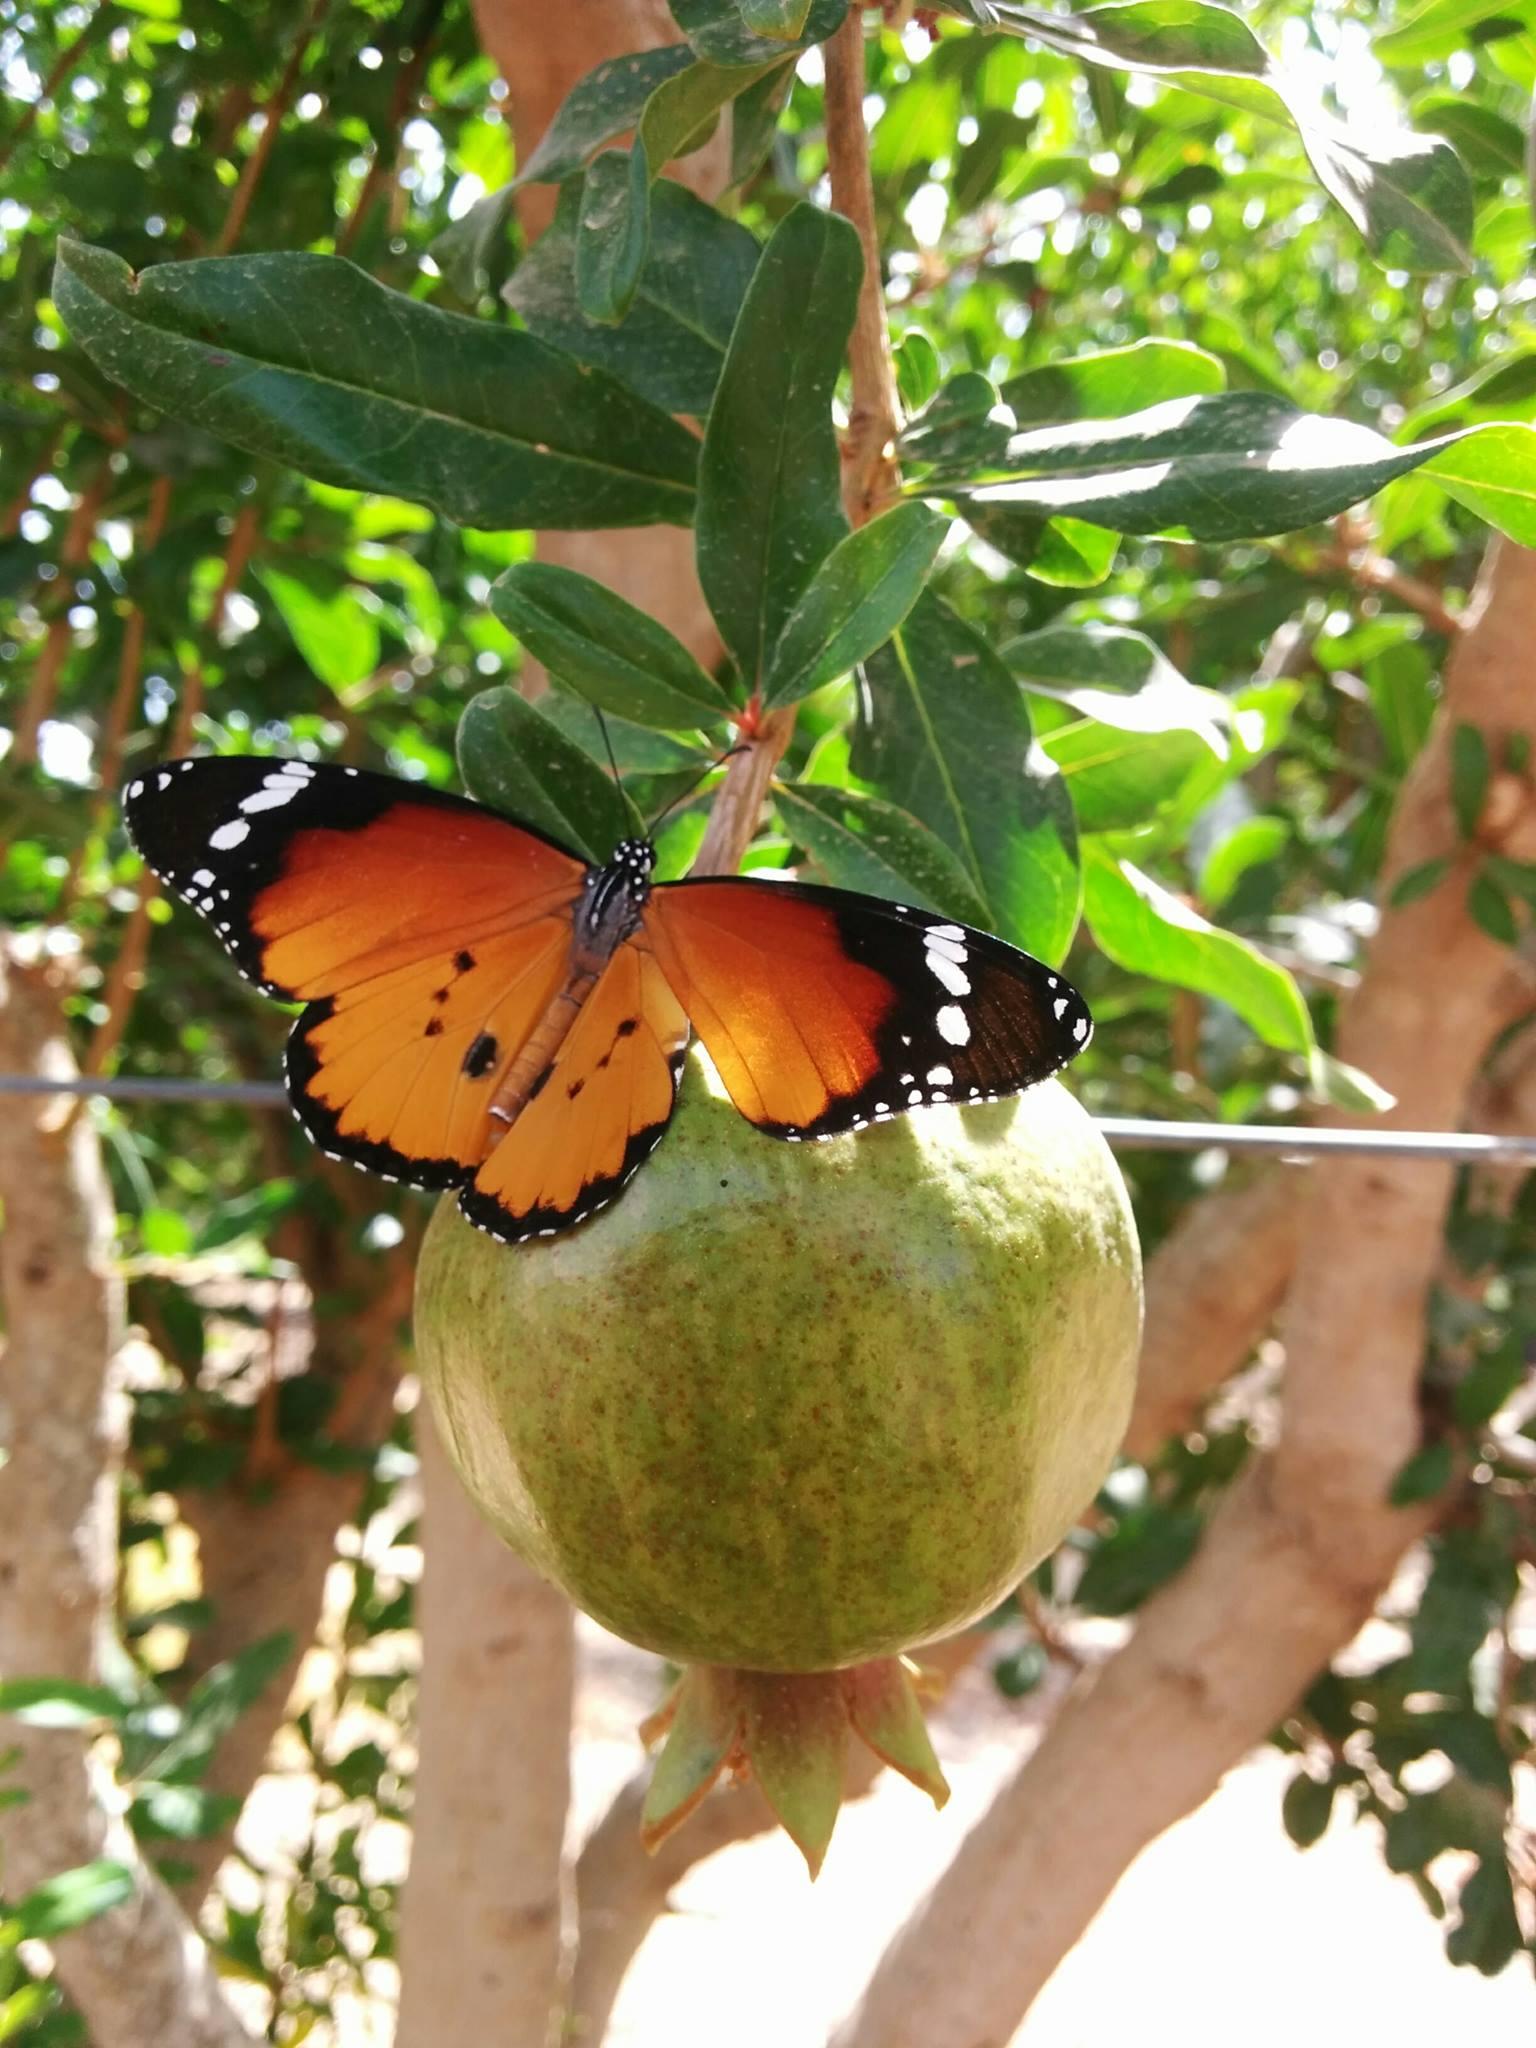 Pomegranate Butterfly Orchard. Photo via FieldIn's Facebook Page